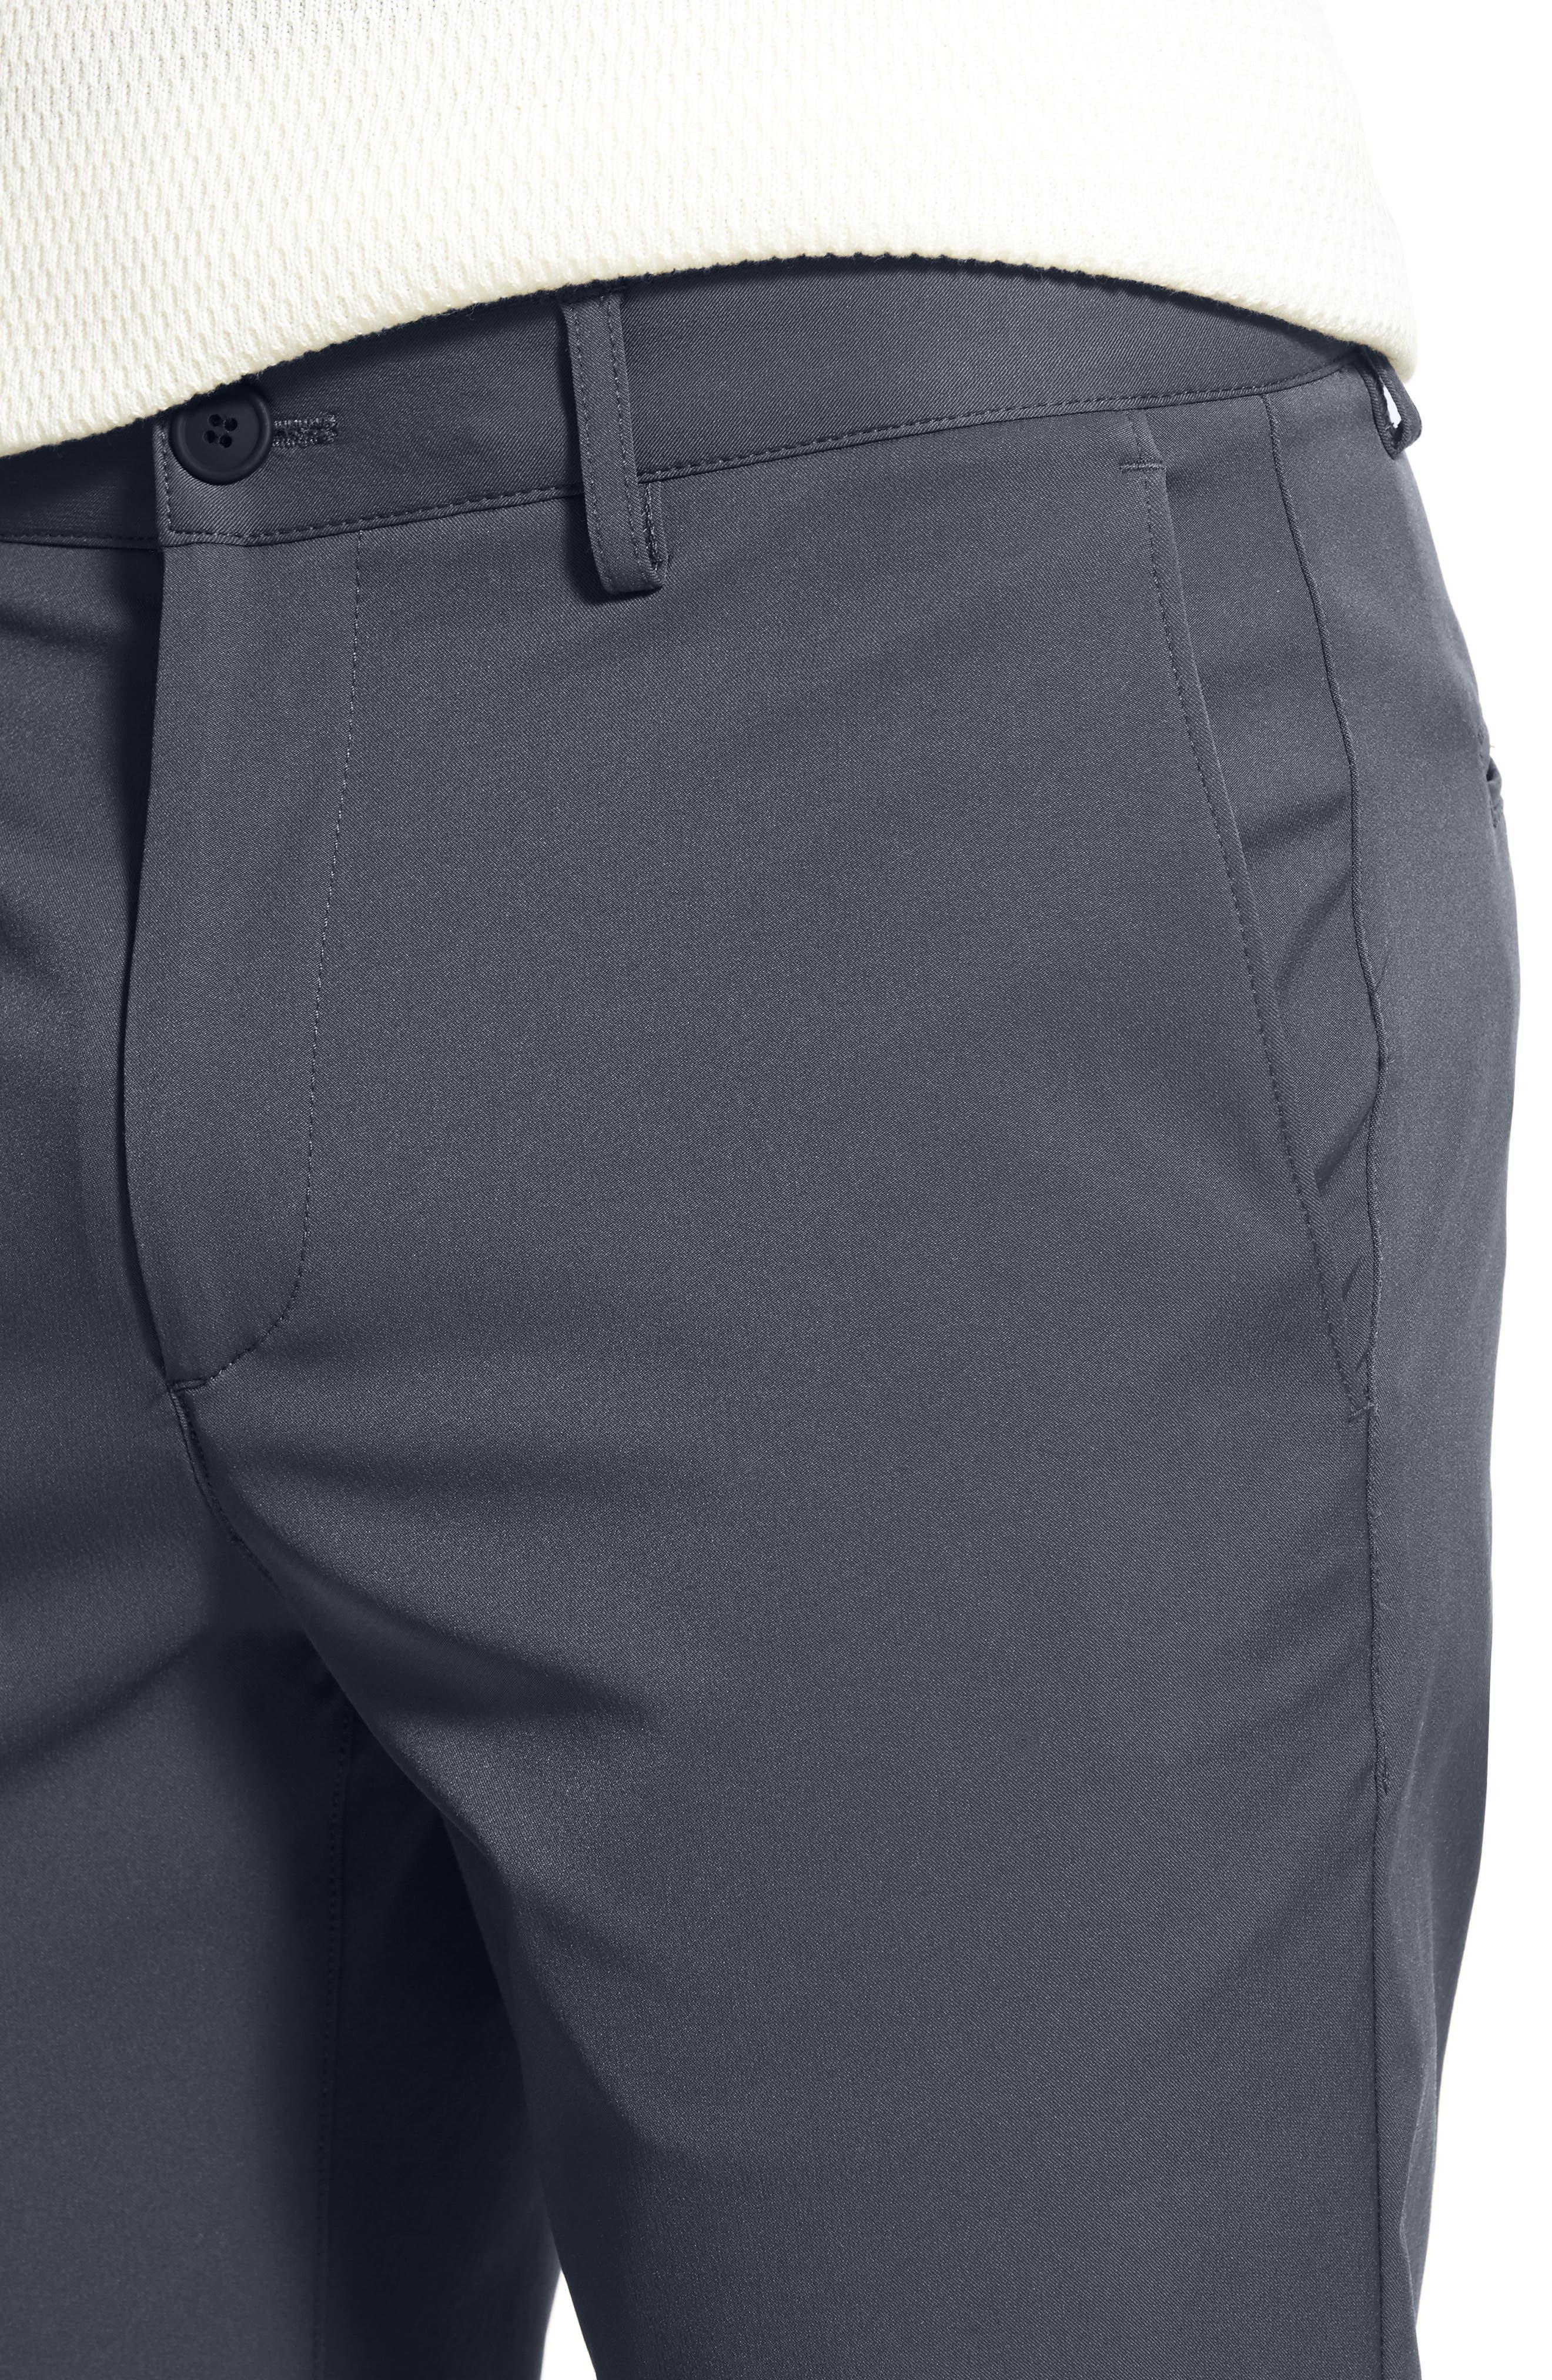 'Zaine Neoteric' Slim Fit Pants,                             Alternate thumbnail 17, color,